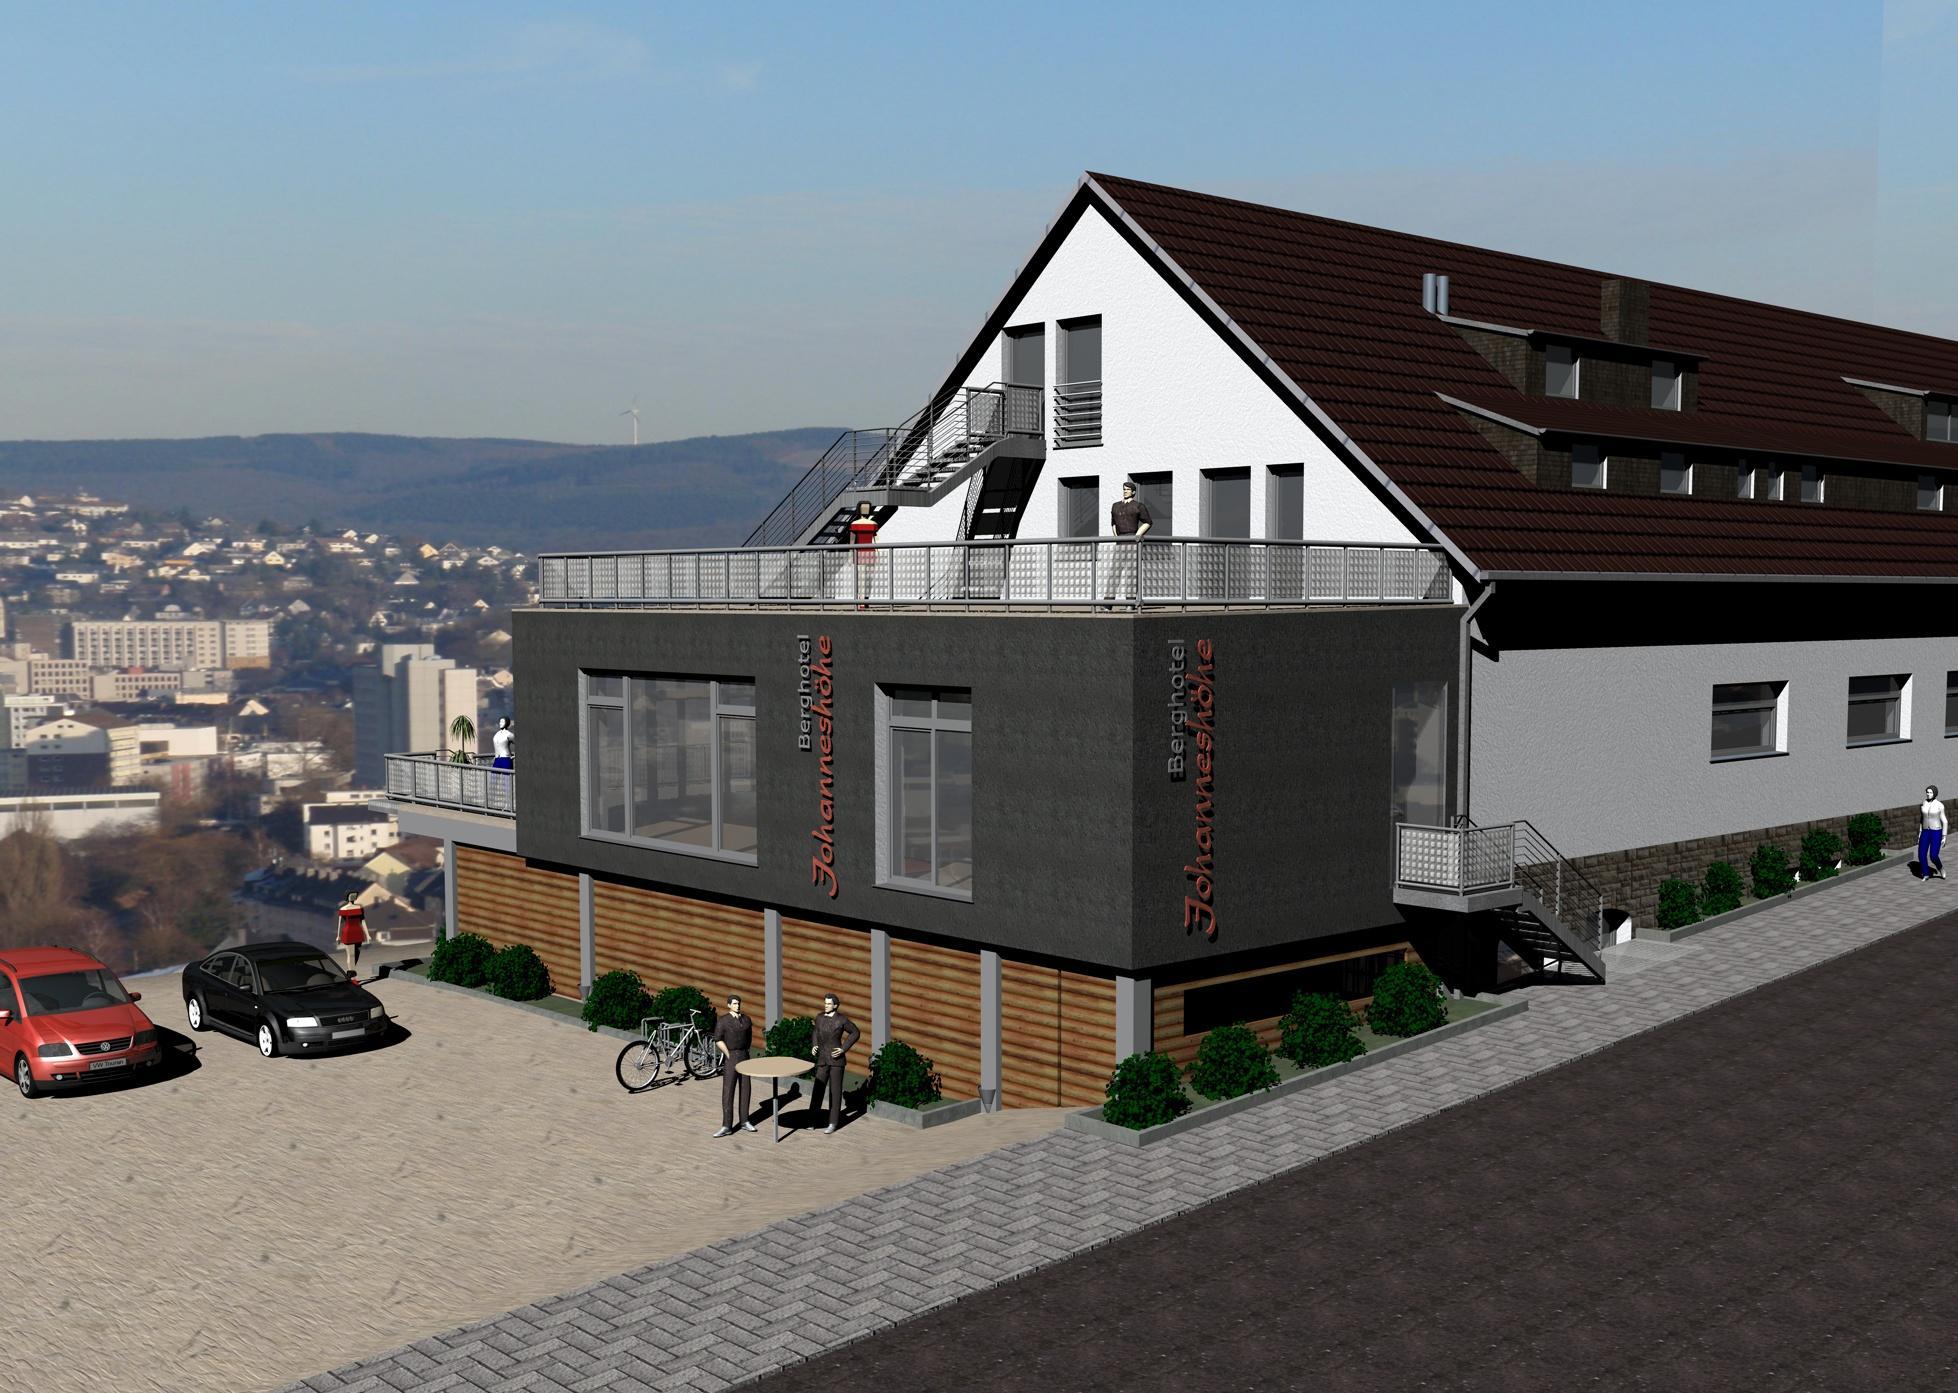 Hotelumbau in Siegen